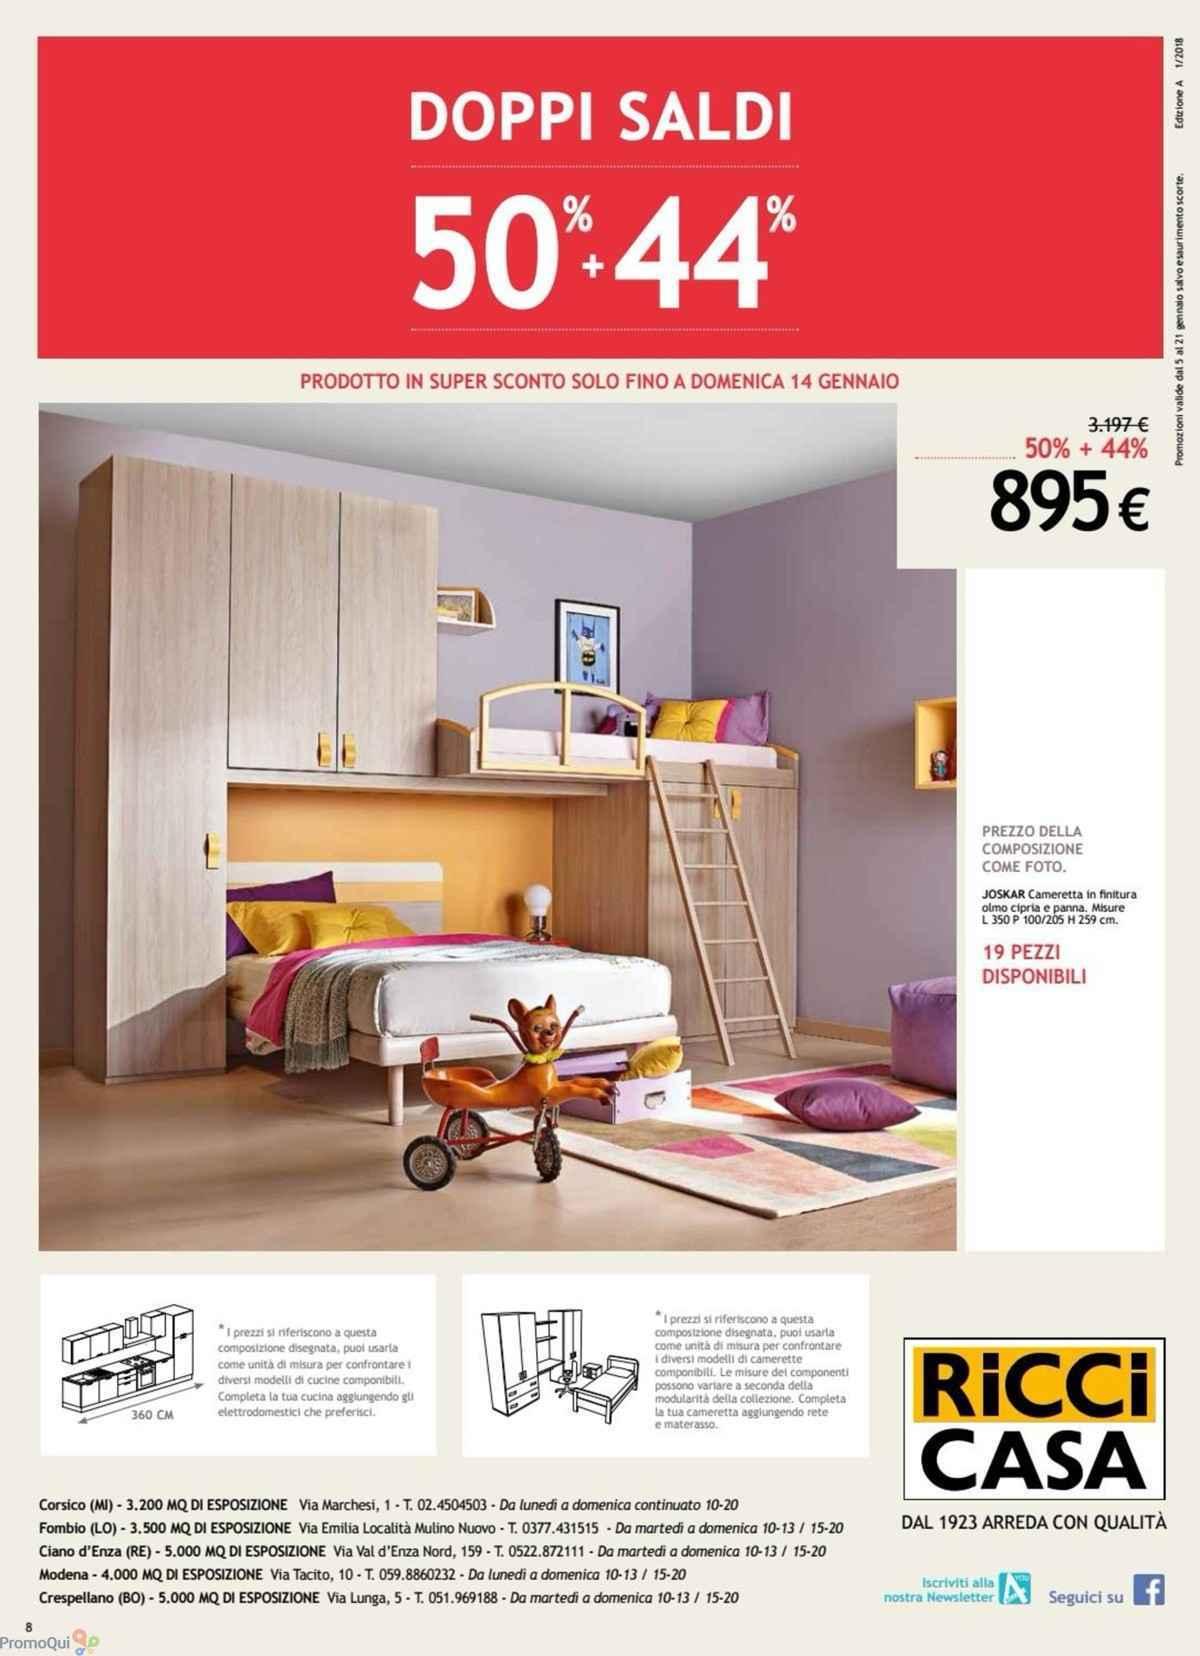 Ricci casa opinioni best cucine ricci casa opinioni gallery design u ideas with ricci casa - Ricci casa camere da letto ...